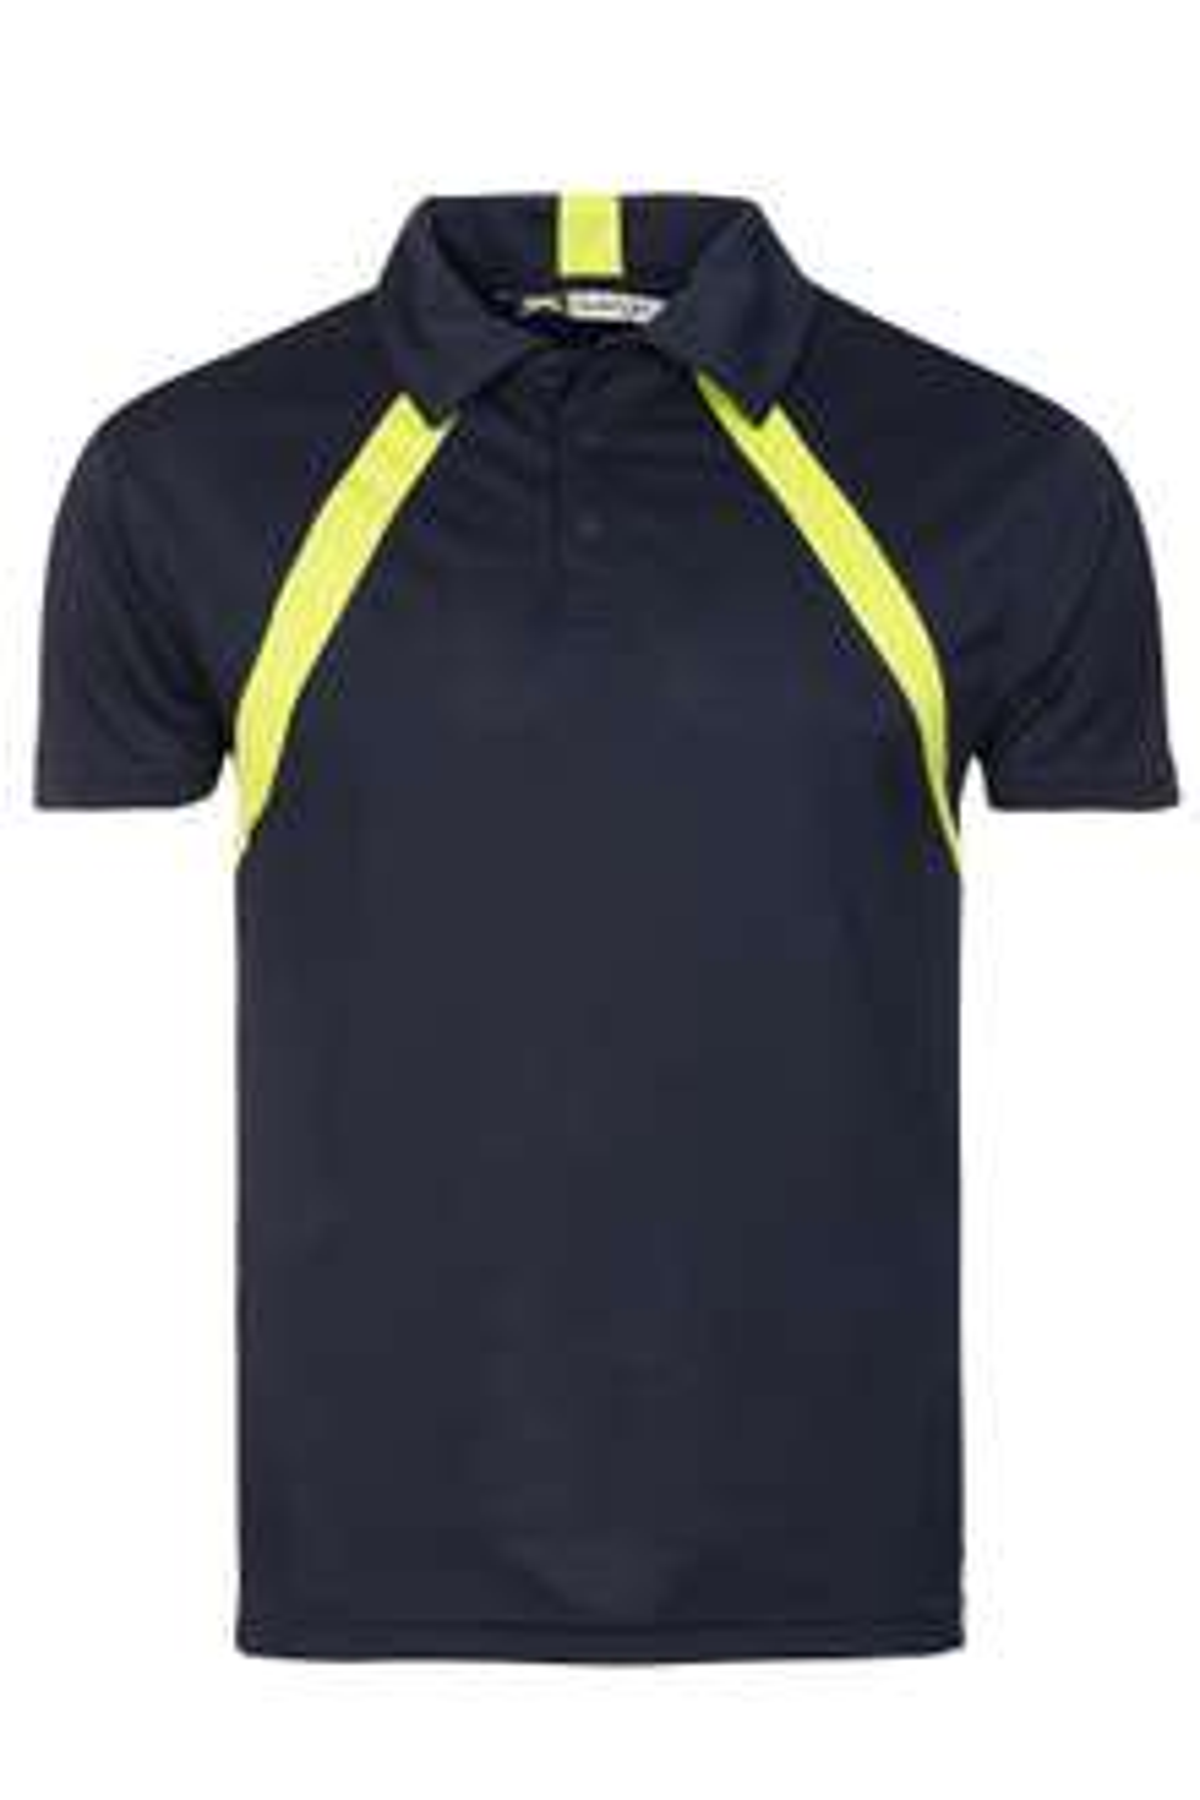 eBay WOW-DEAL Polo Shirts für 1.99 Euro inkl. VERSAND